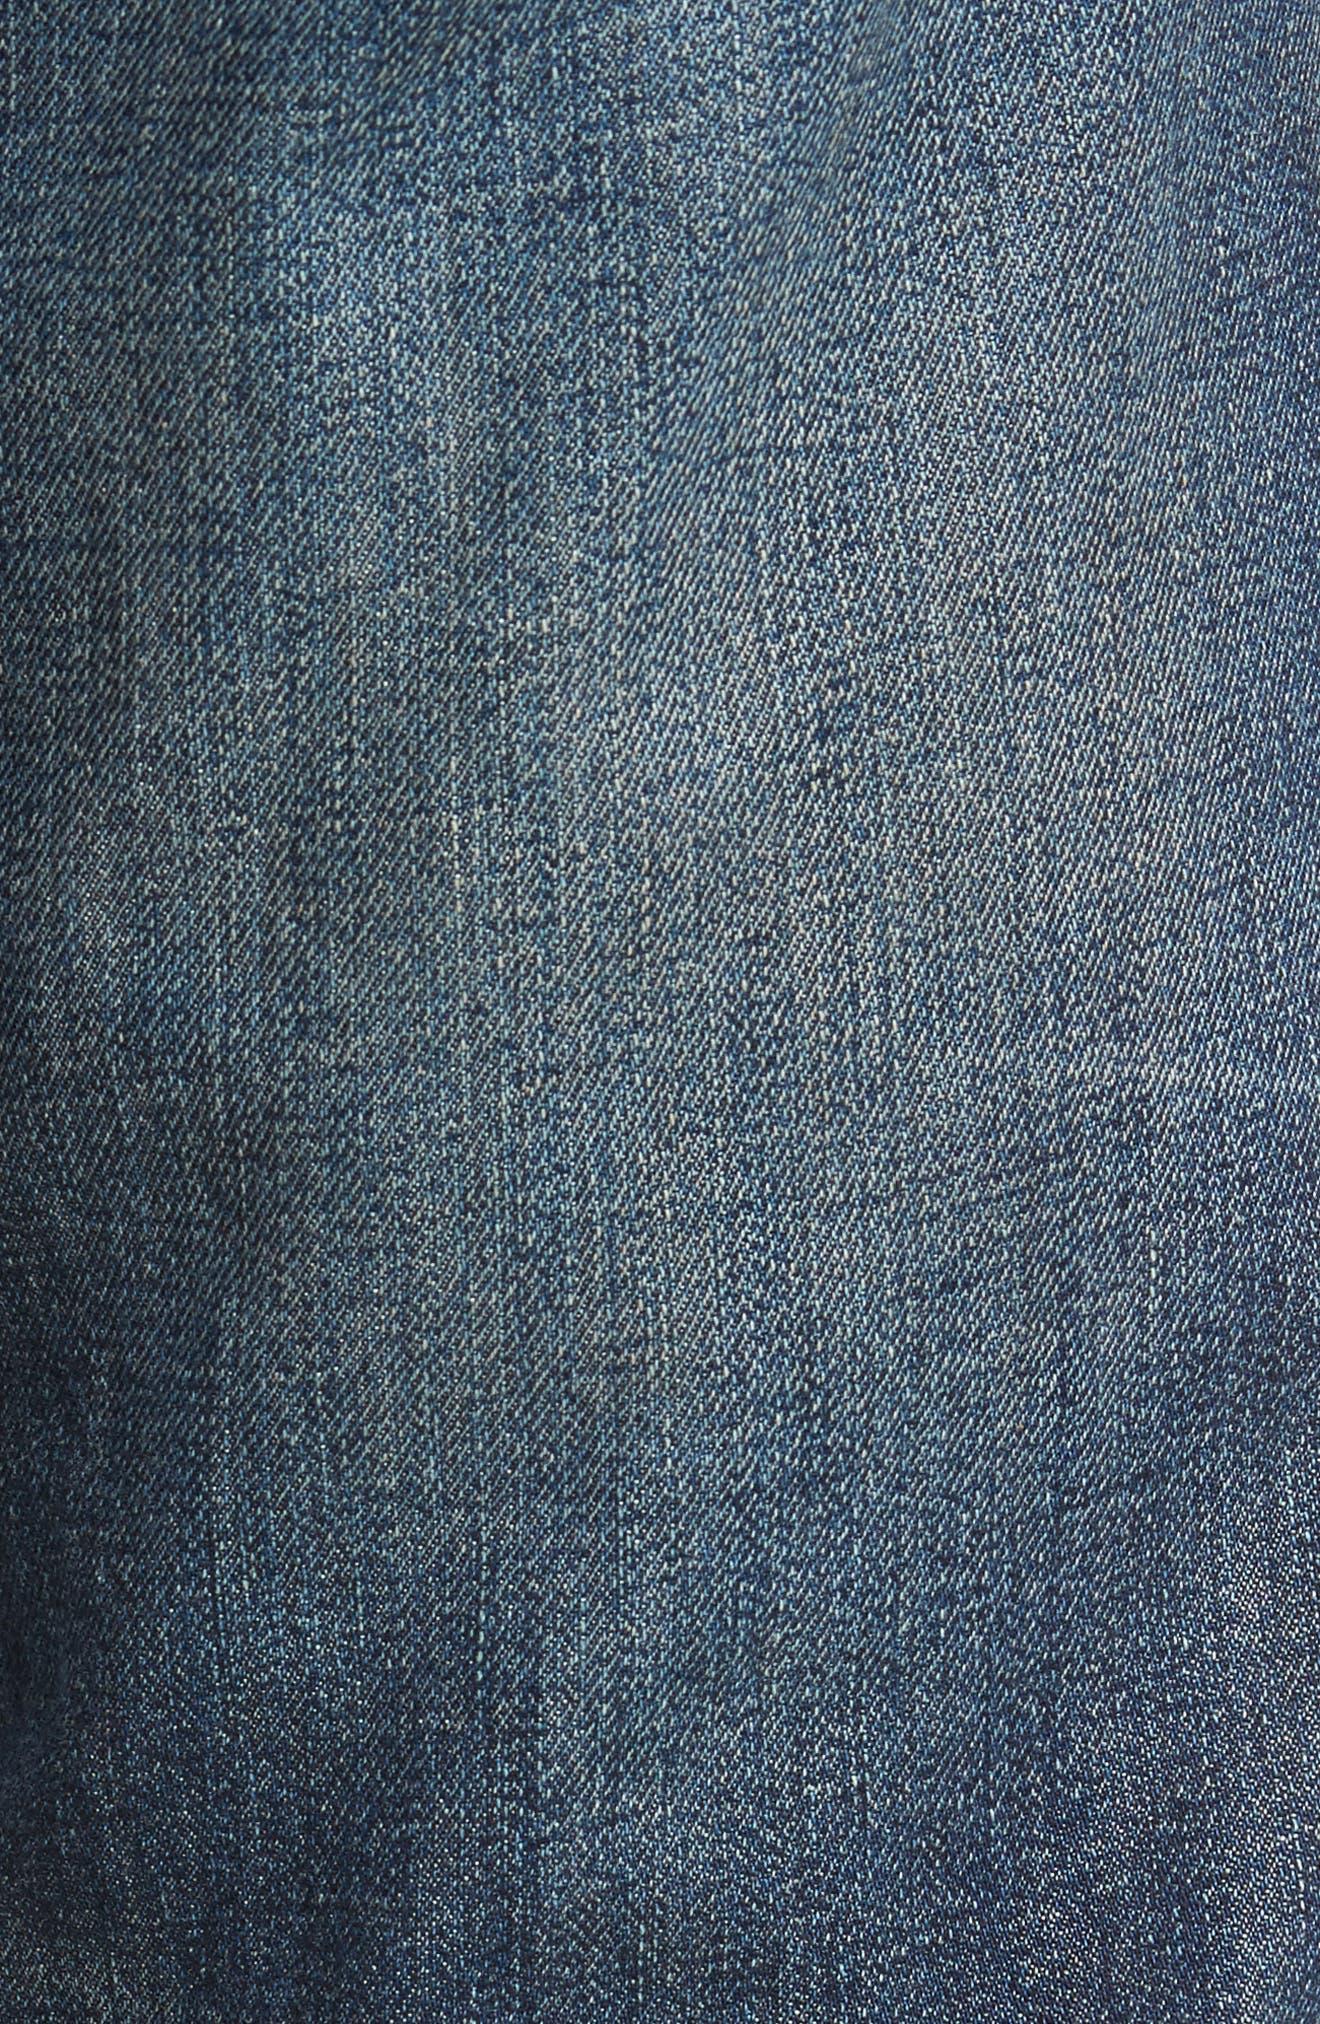 Geno Straight Leg Jeans,                             Alternate thumbnail 5, color,                             401